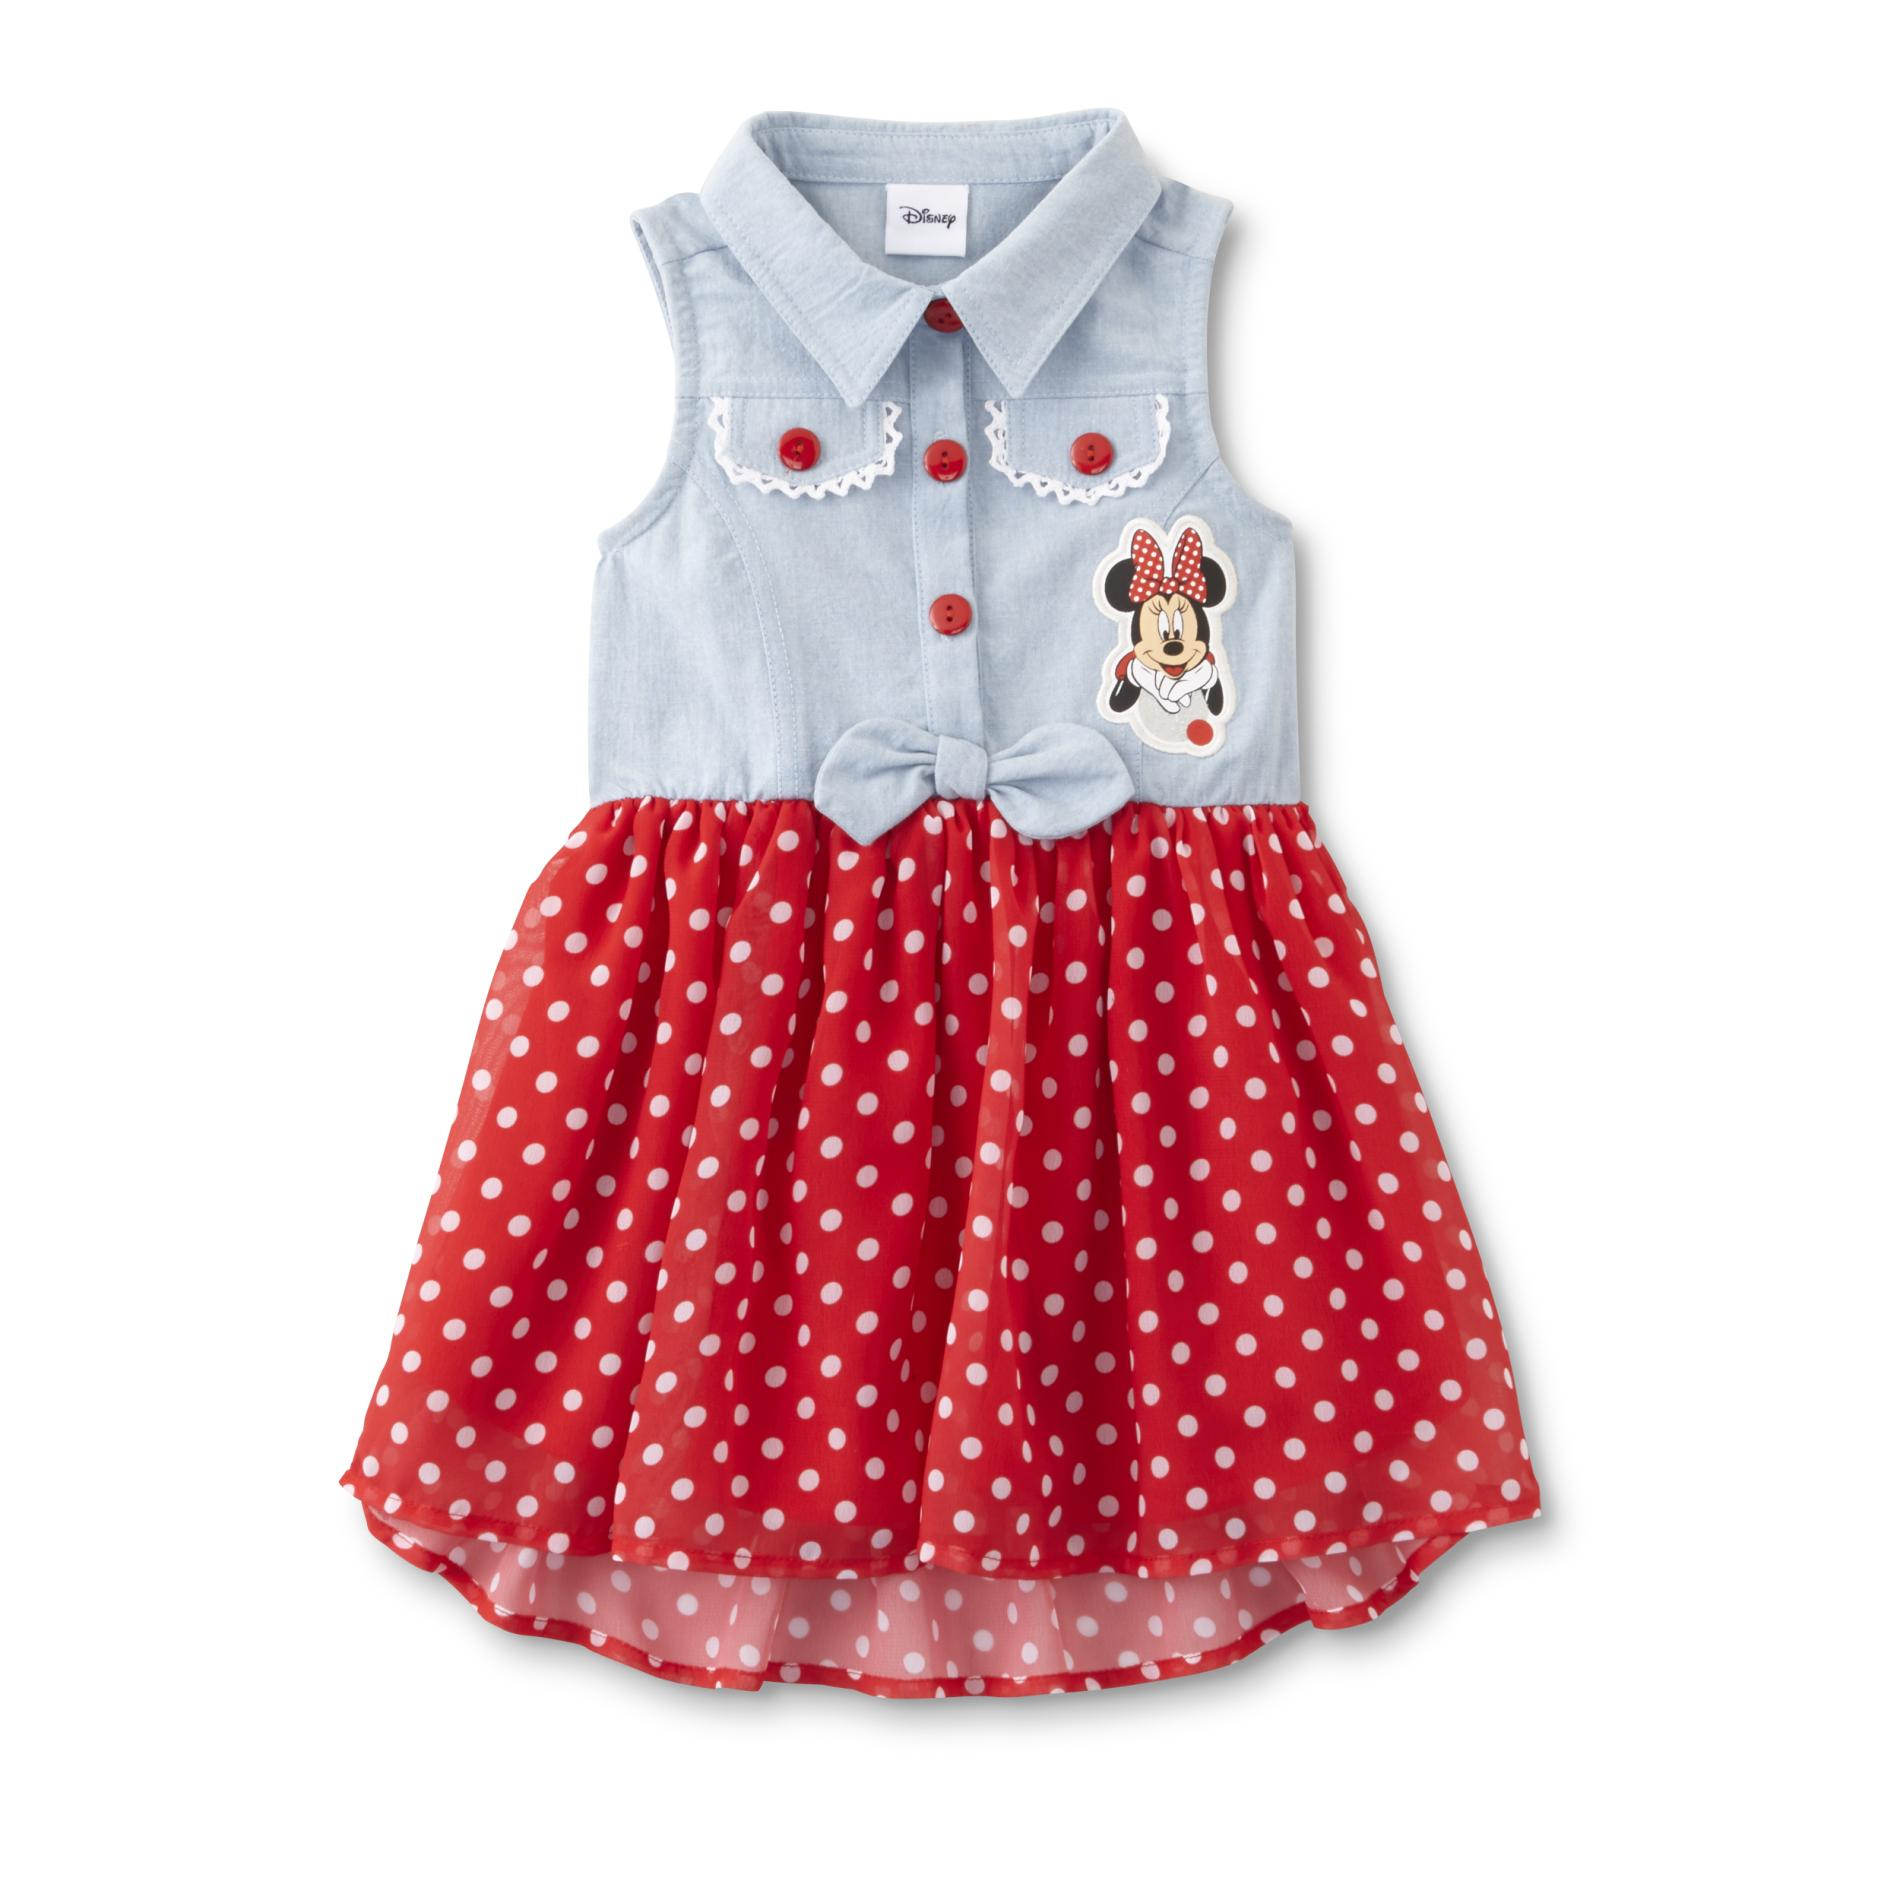 Disney Baby Minnie Mouse Toddler Girl s Sleeveless Dress